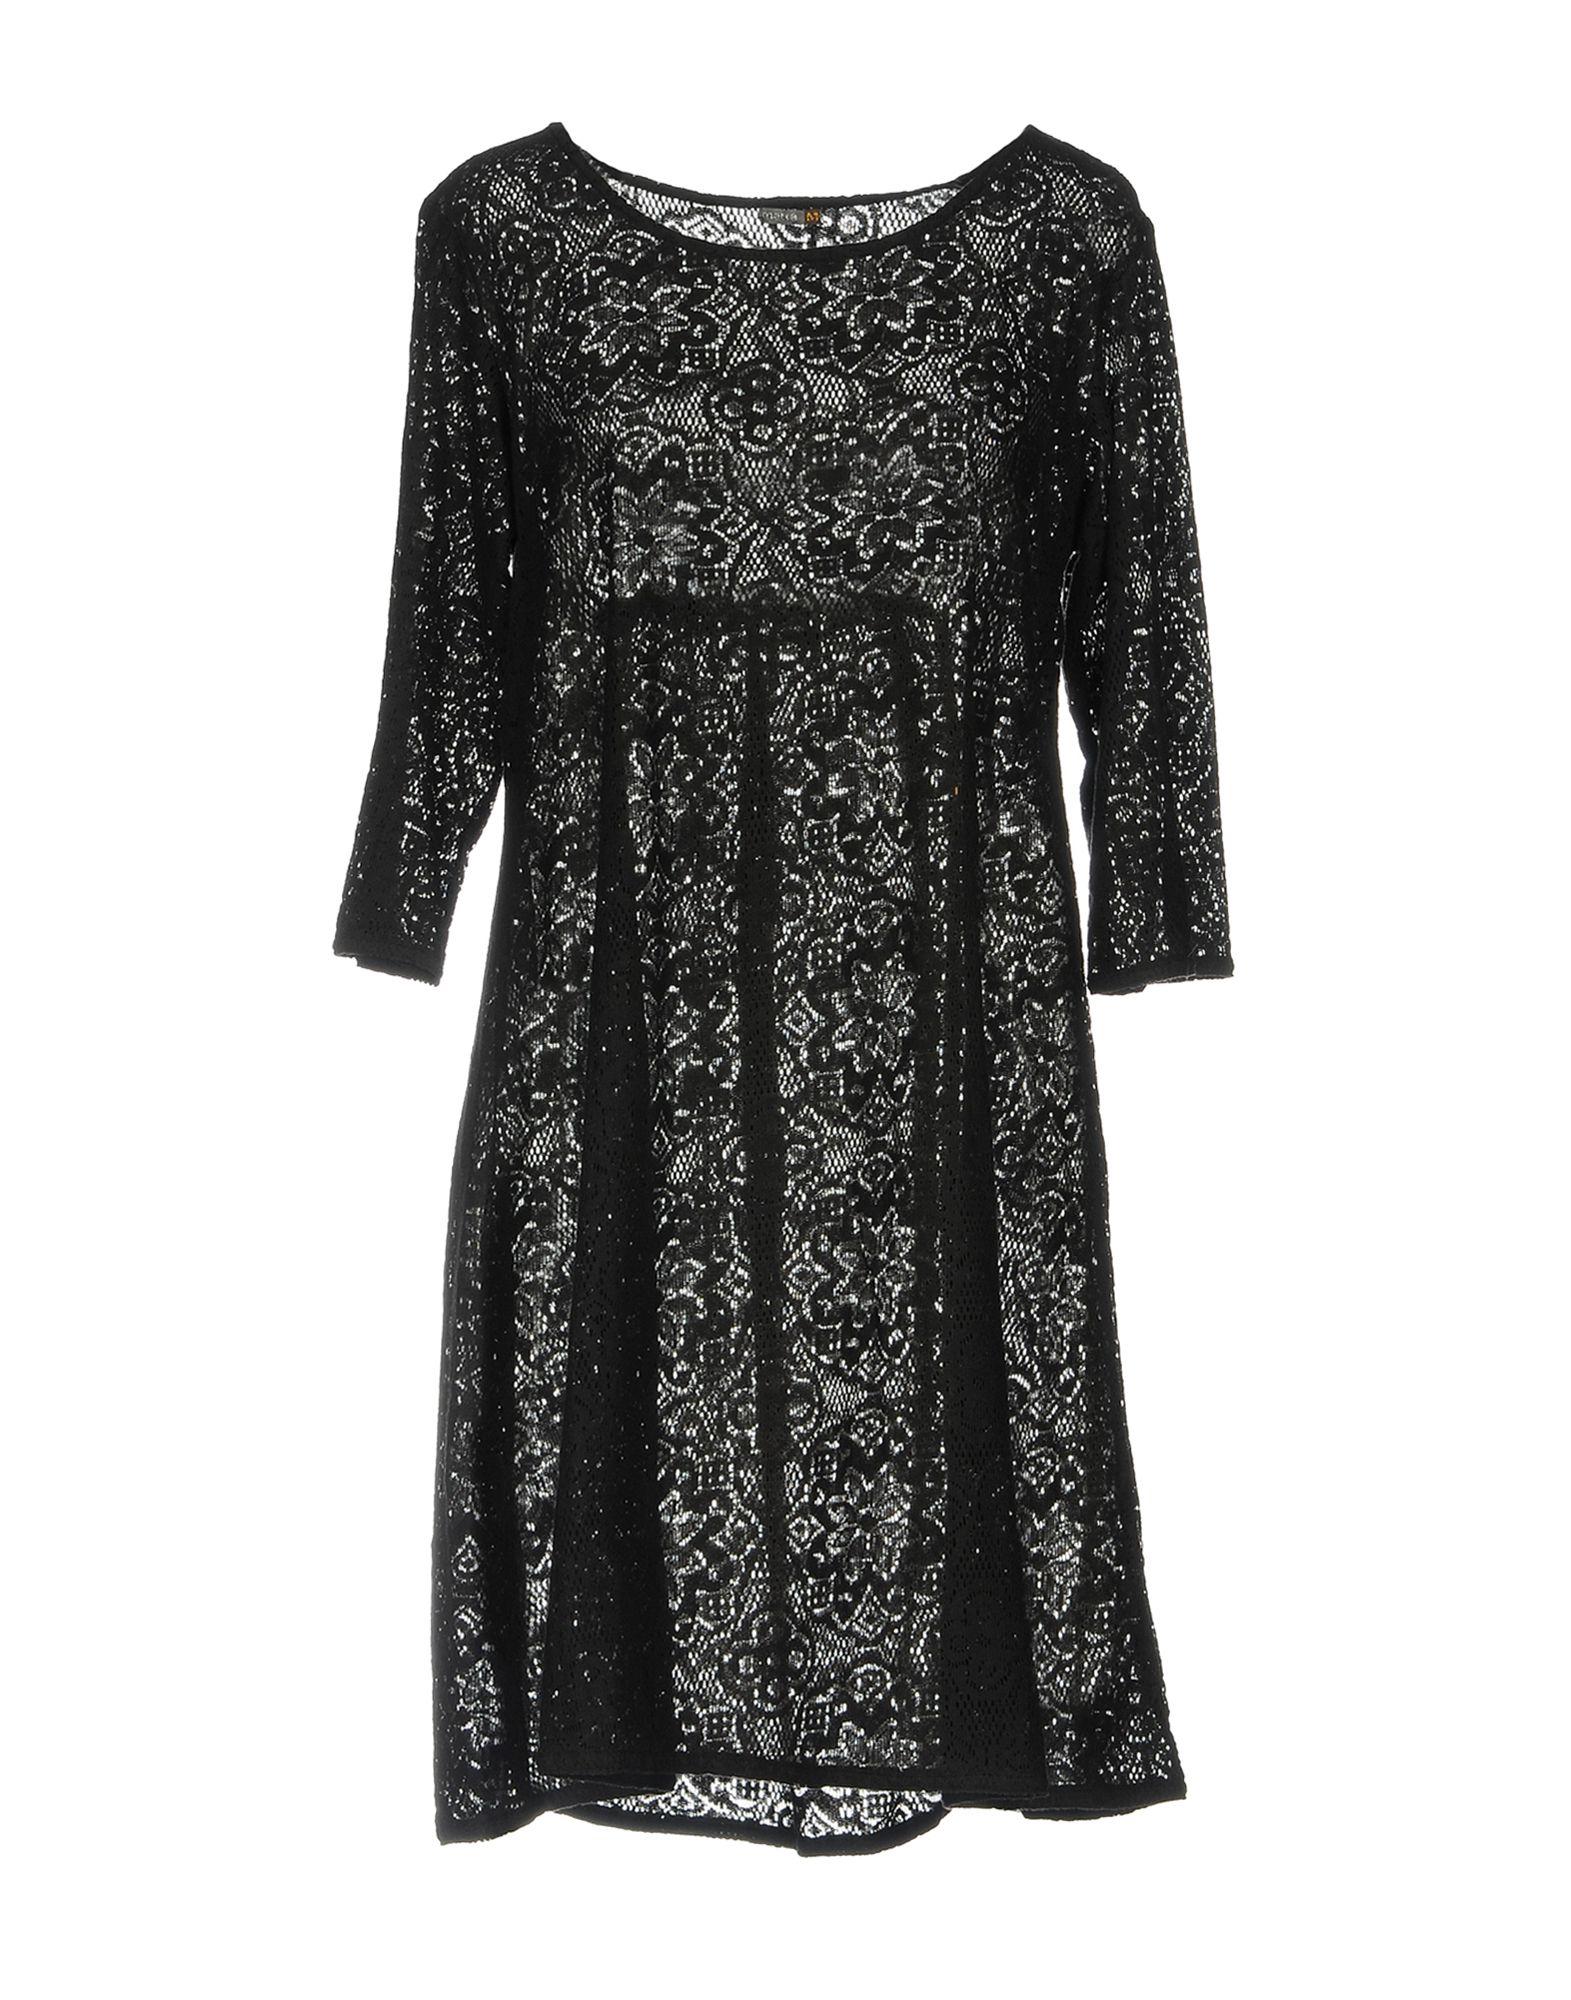 MATTA Short Dress in Black